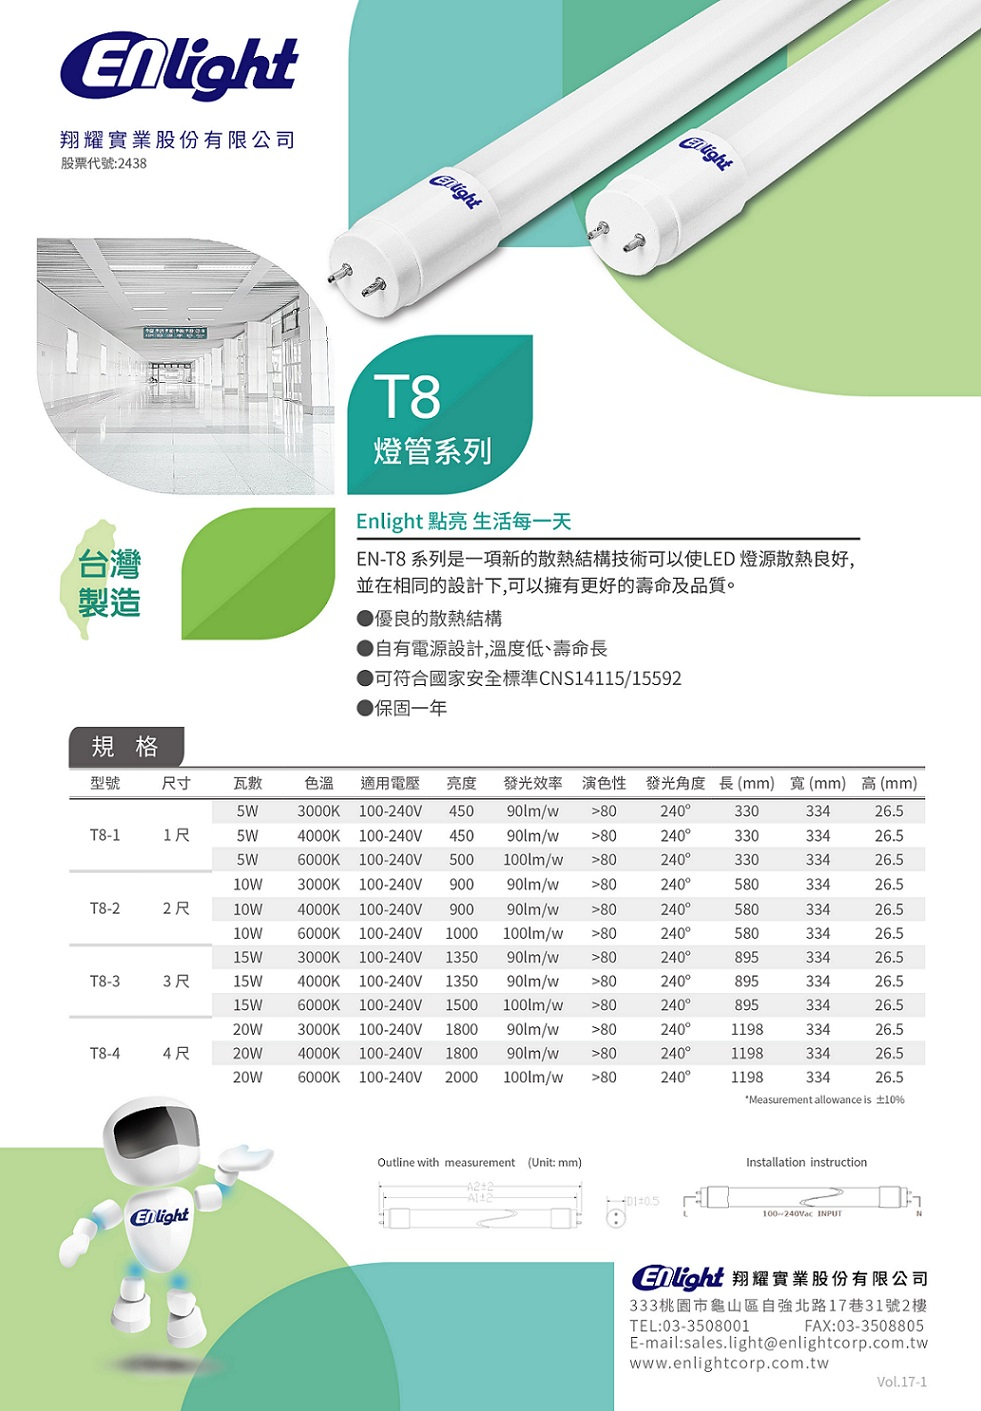 LED燈管 | 翔耀實業股份有限公司 LED